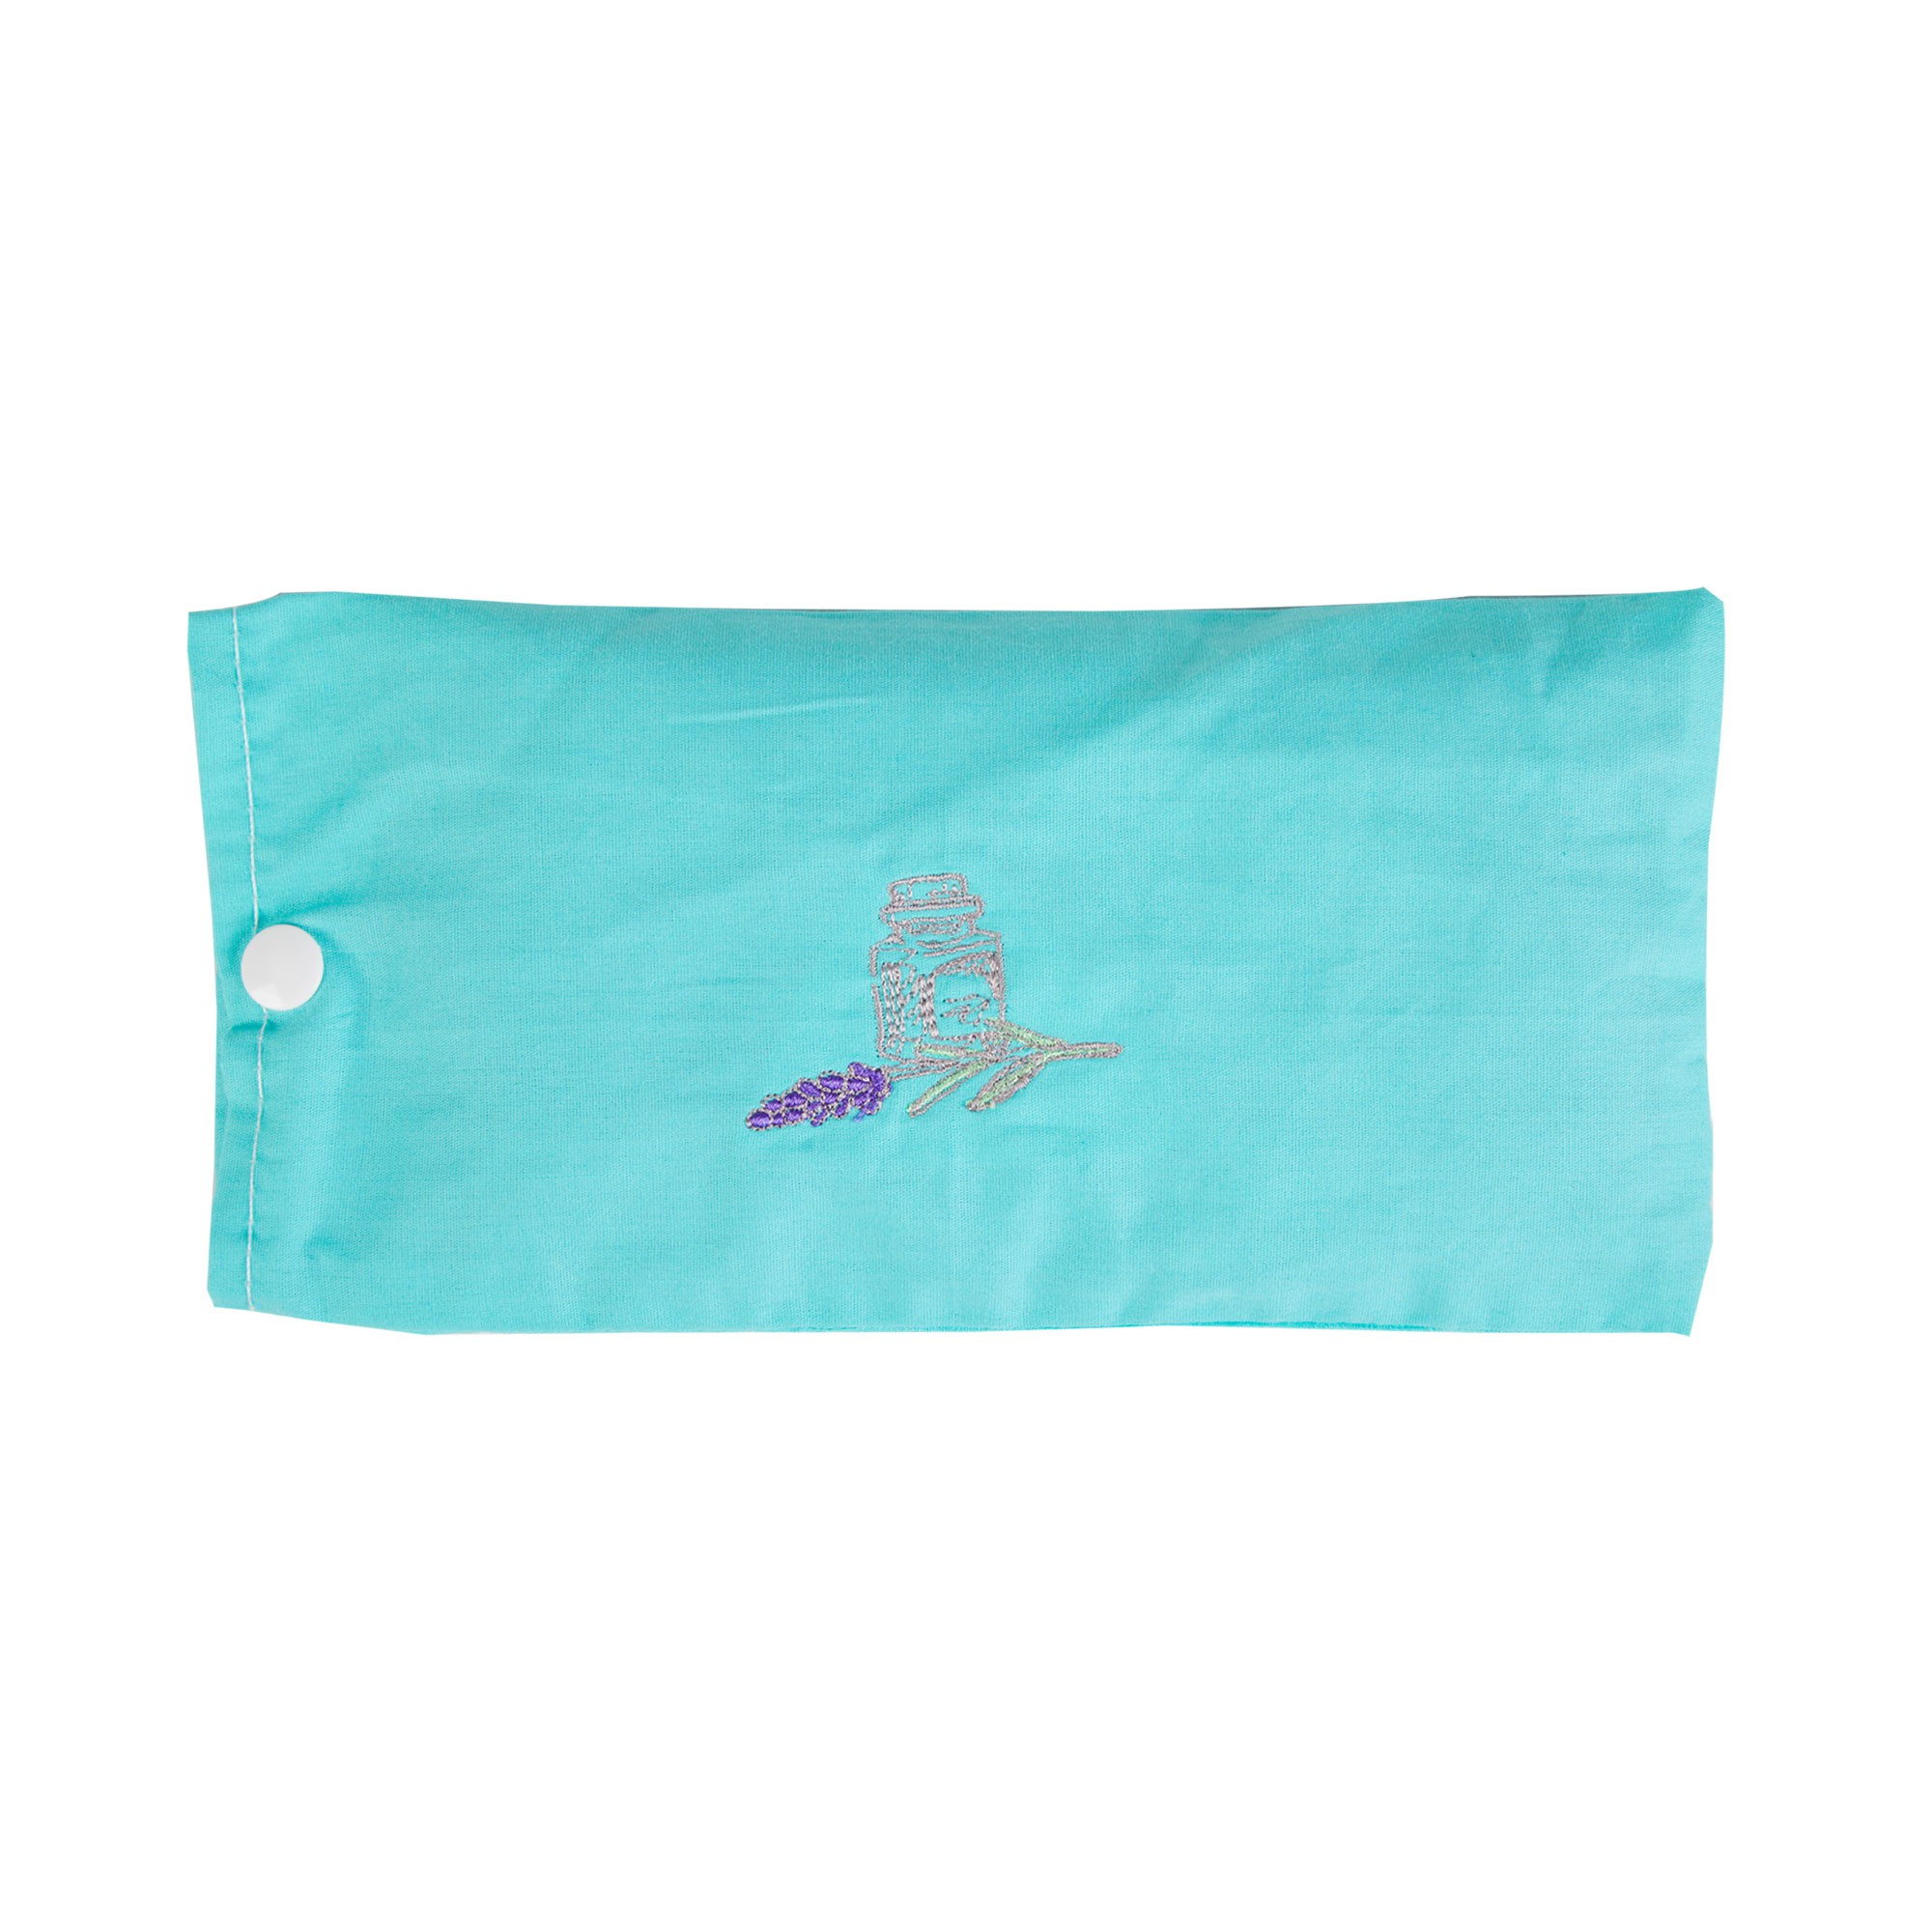 Almofada térmica aromática (alfazema azul)